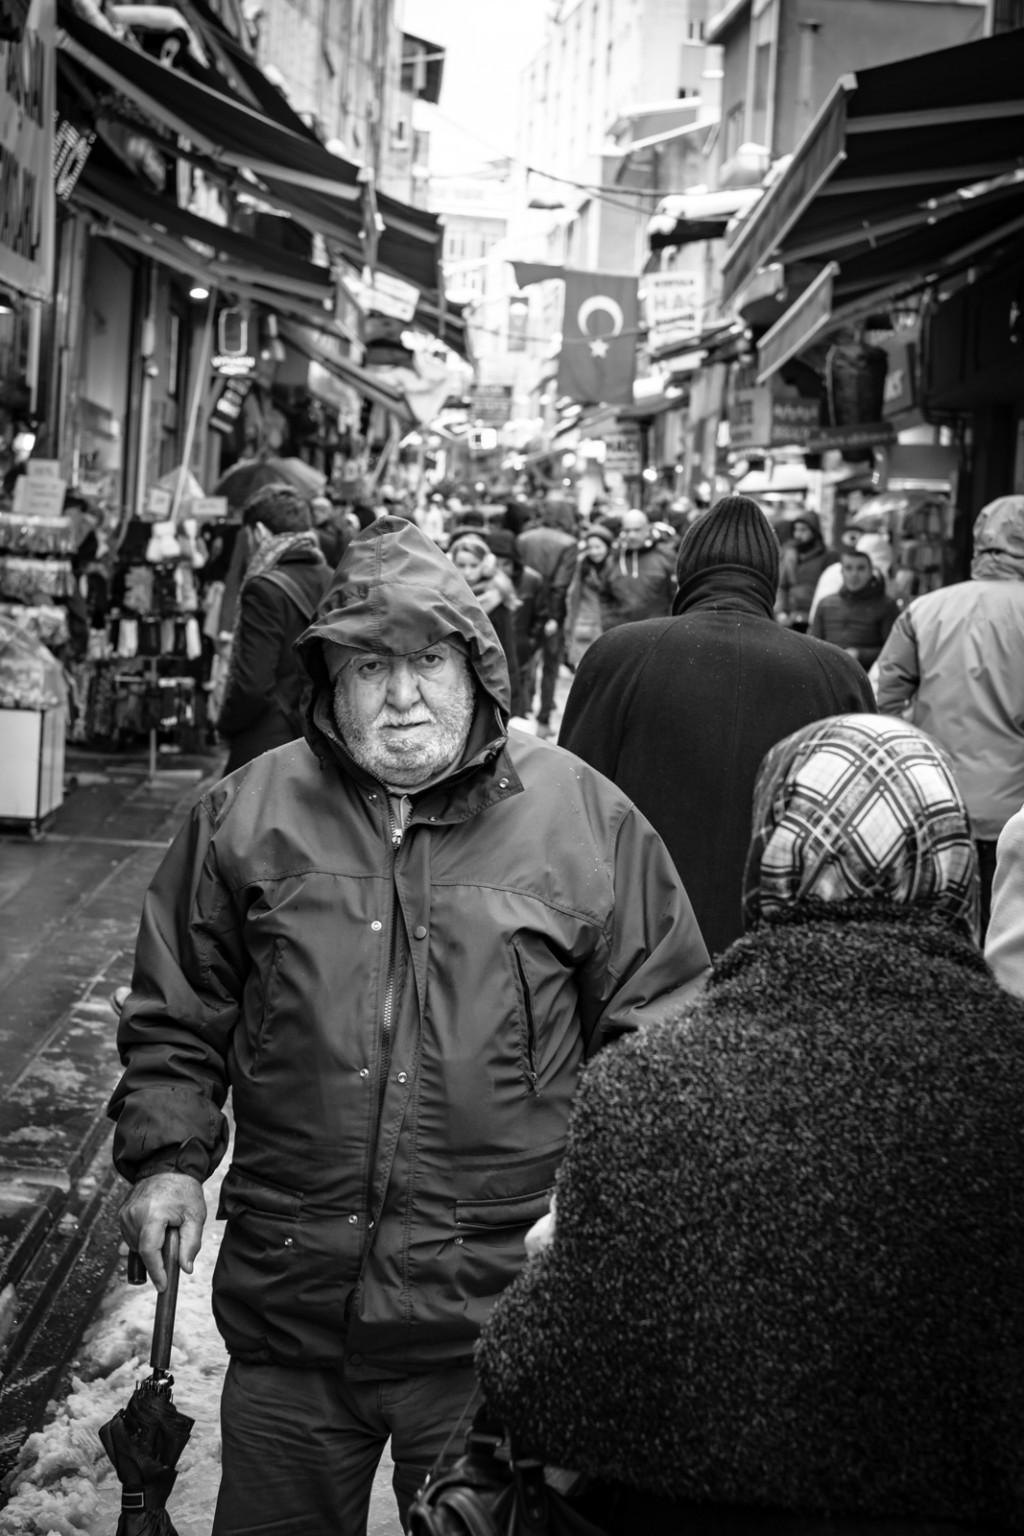 BENJAMIN MARKSTEIN Istanbul Snowlike